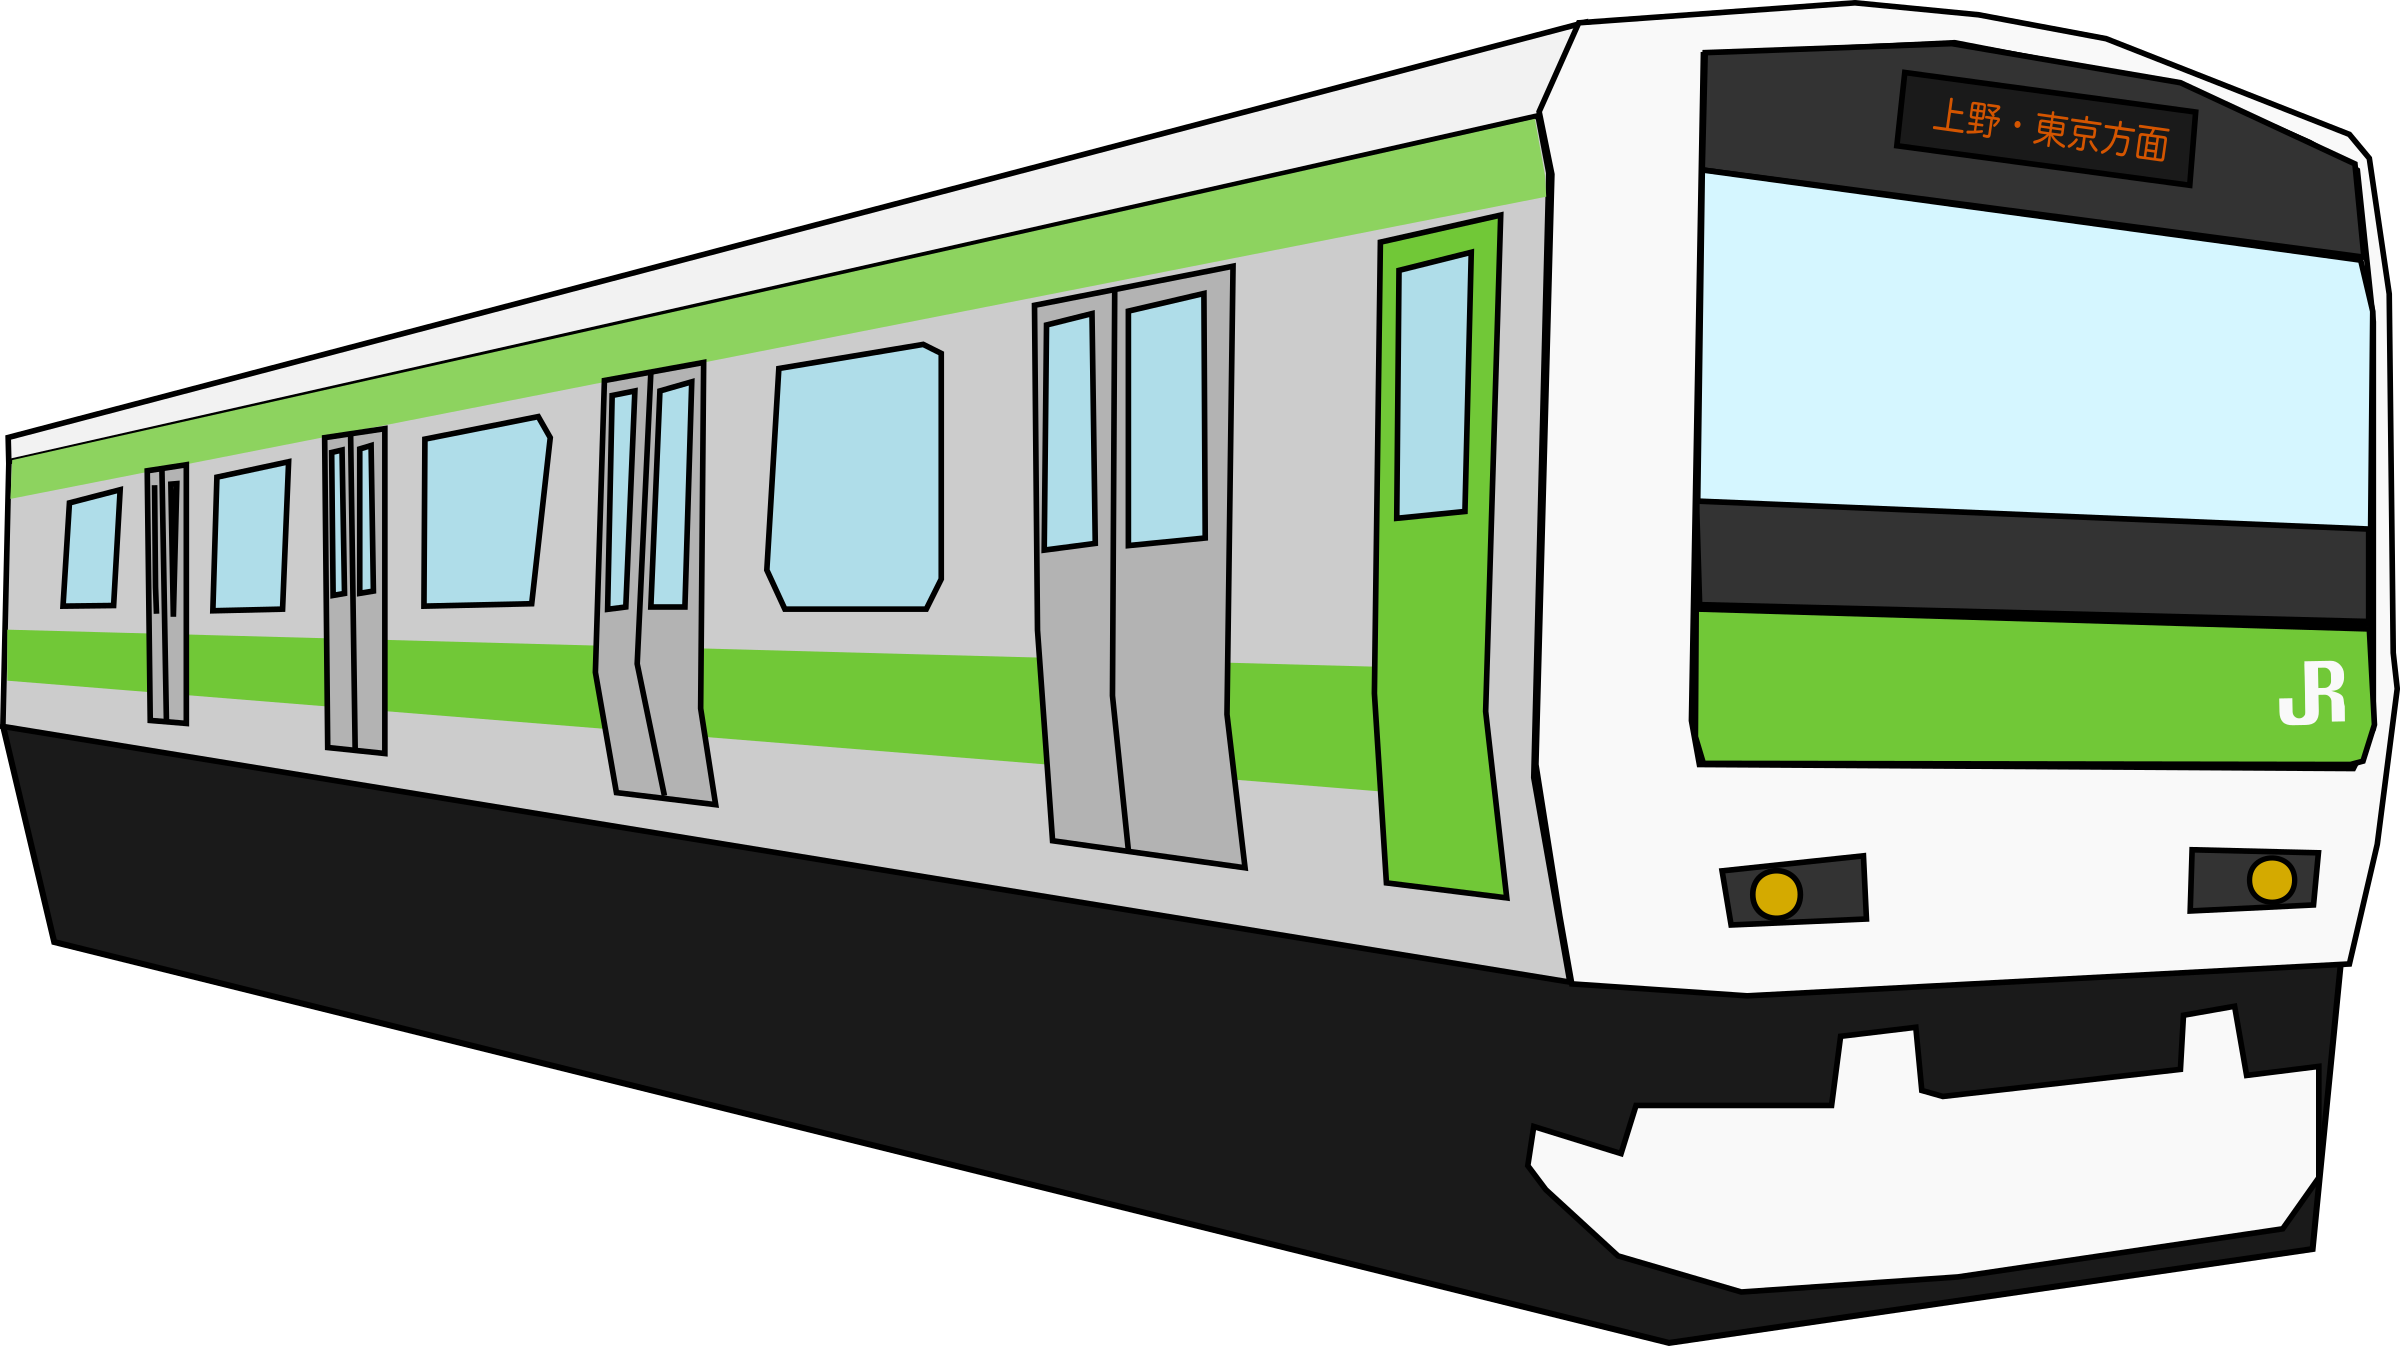 Yamanote big image png. Free clipart train